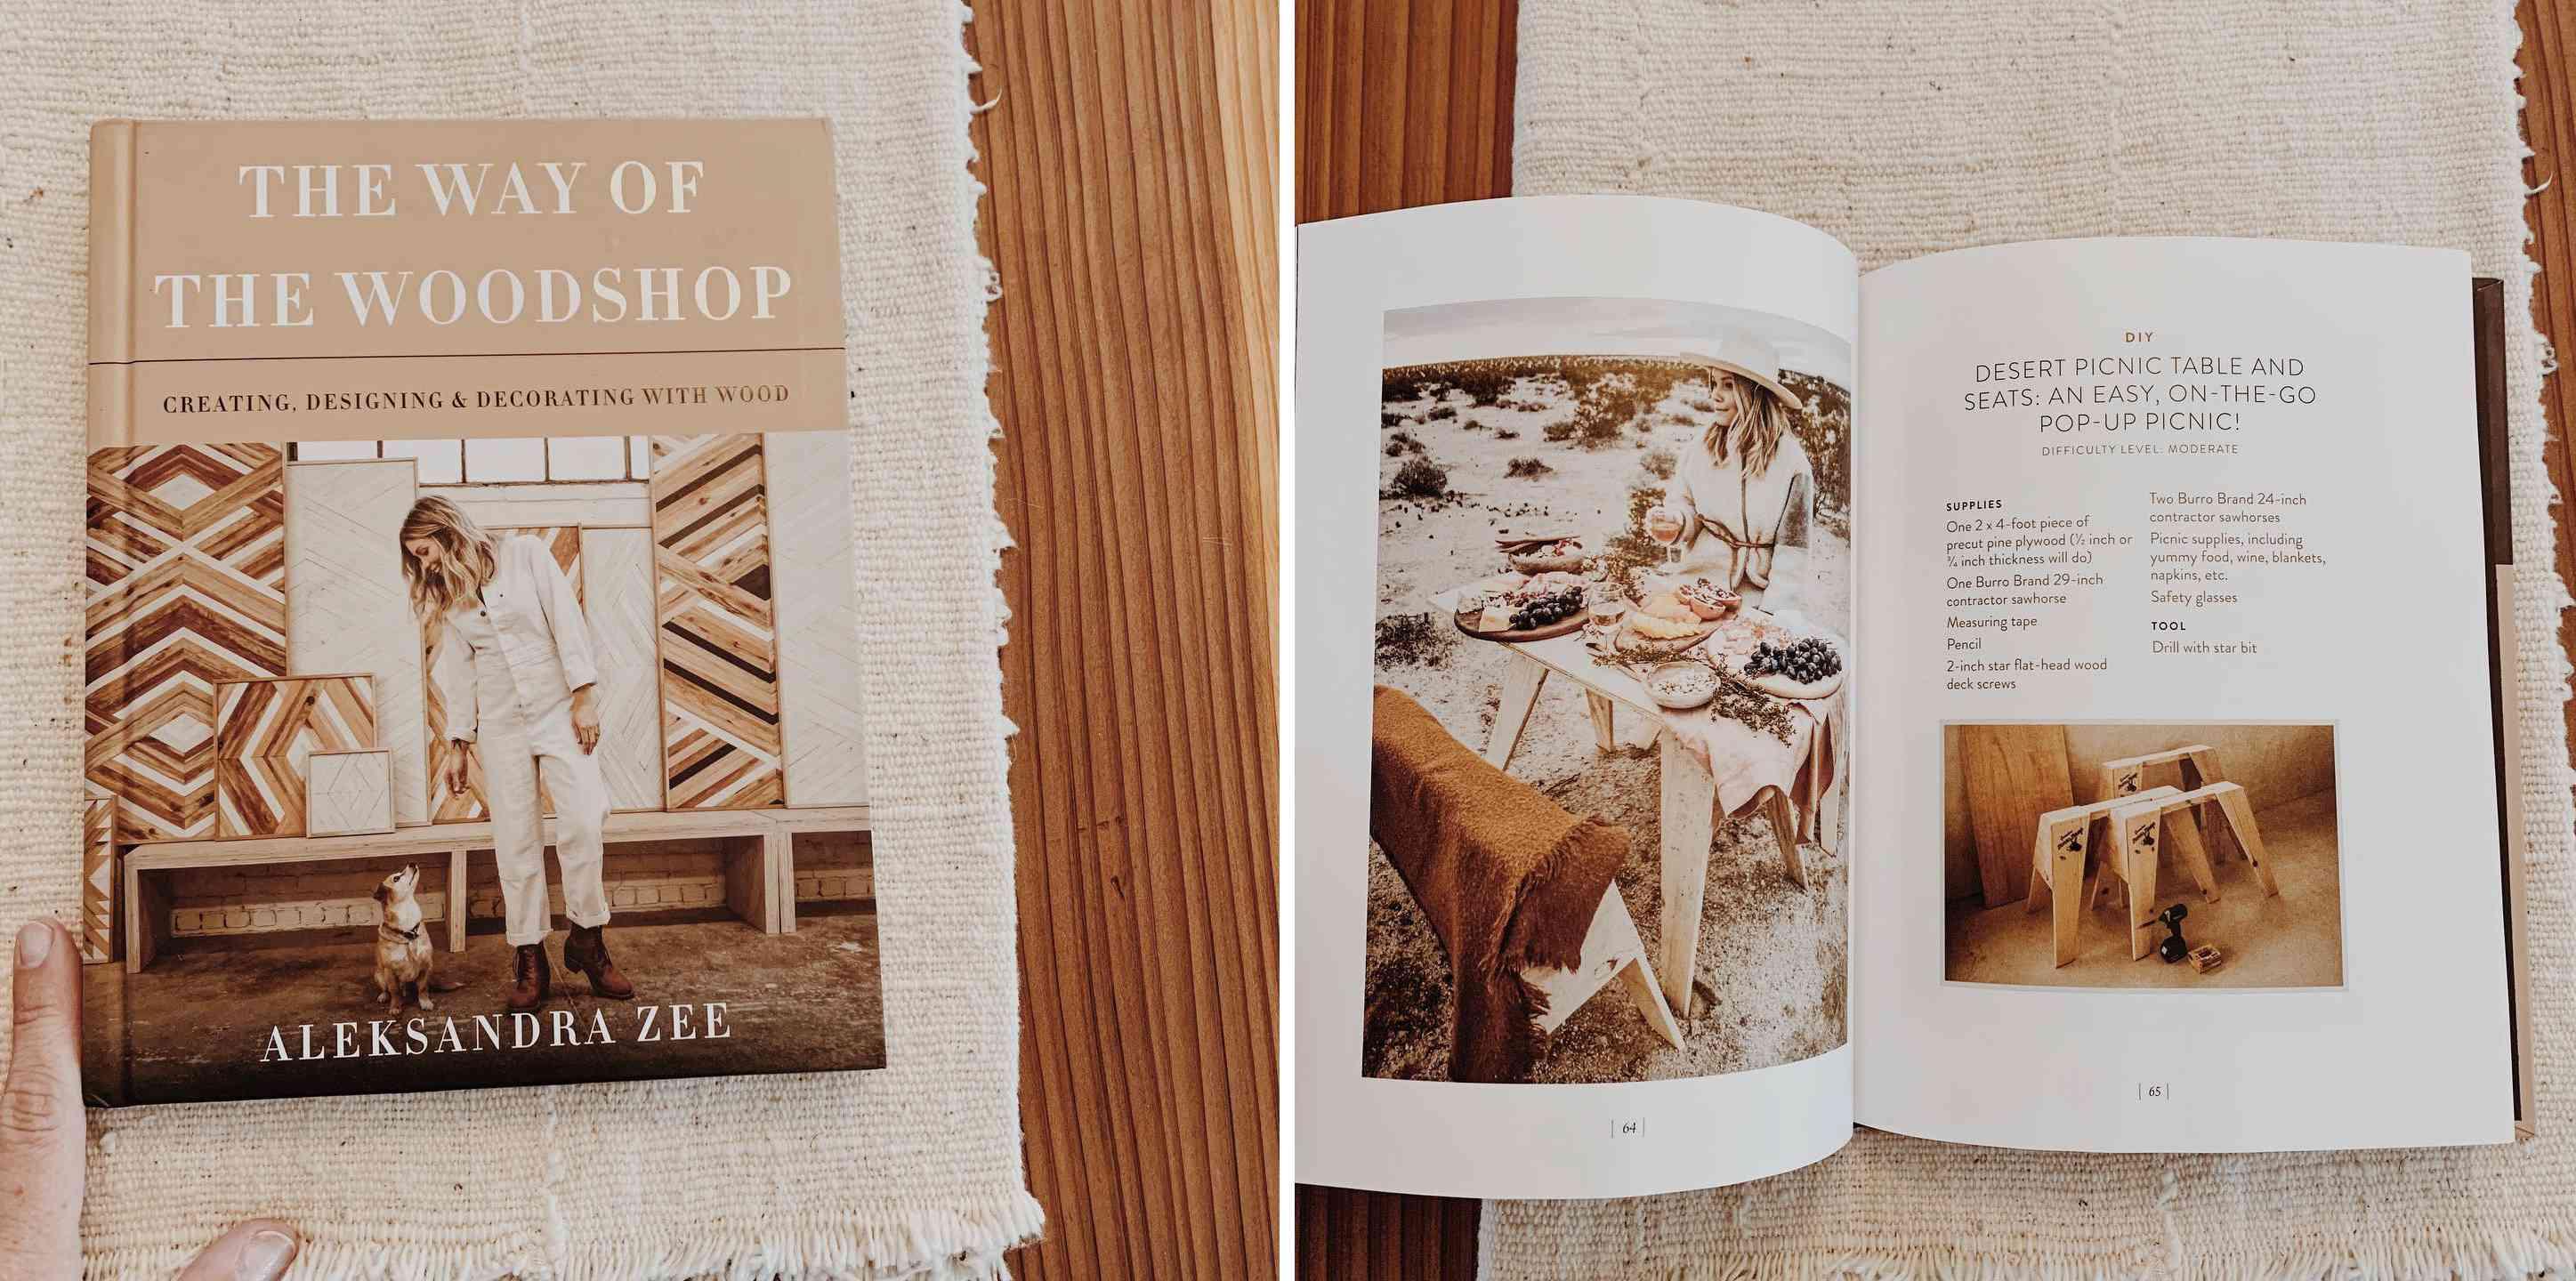 The Way of the Woodshop book by Aleksandra Zee